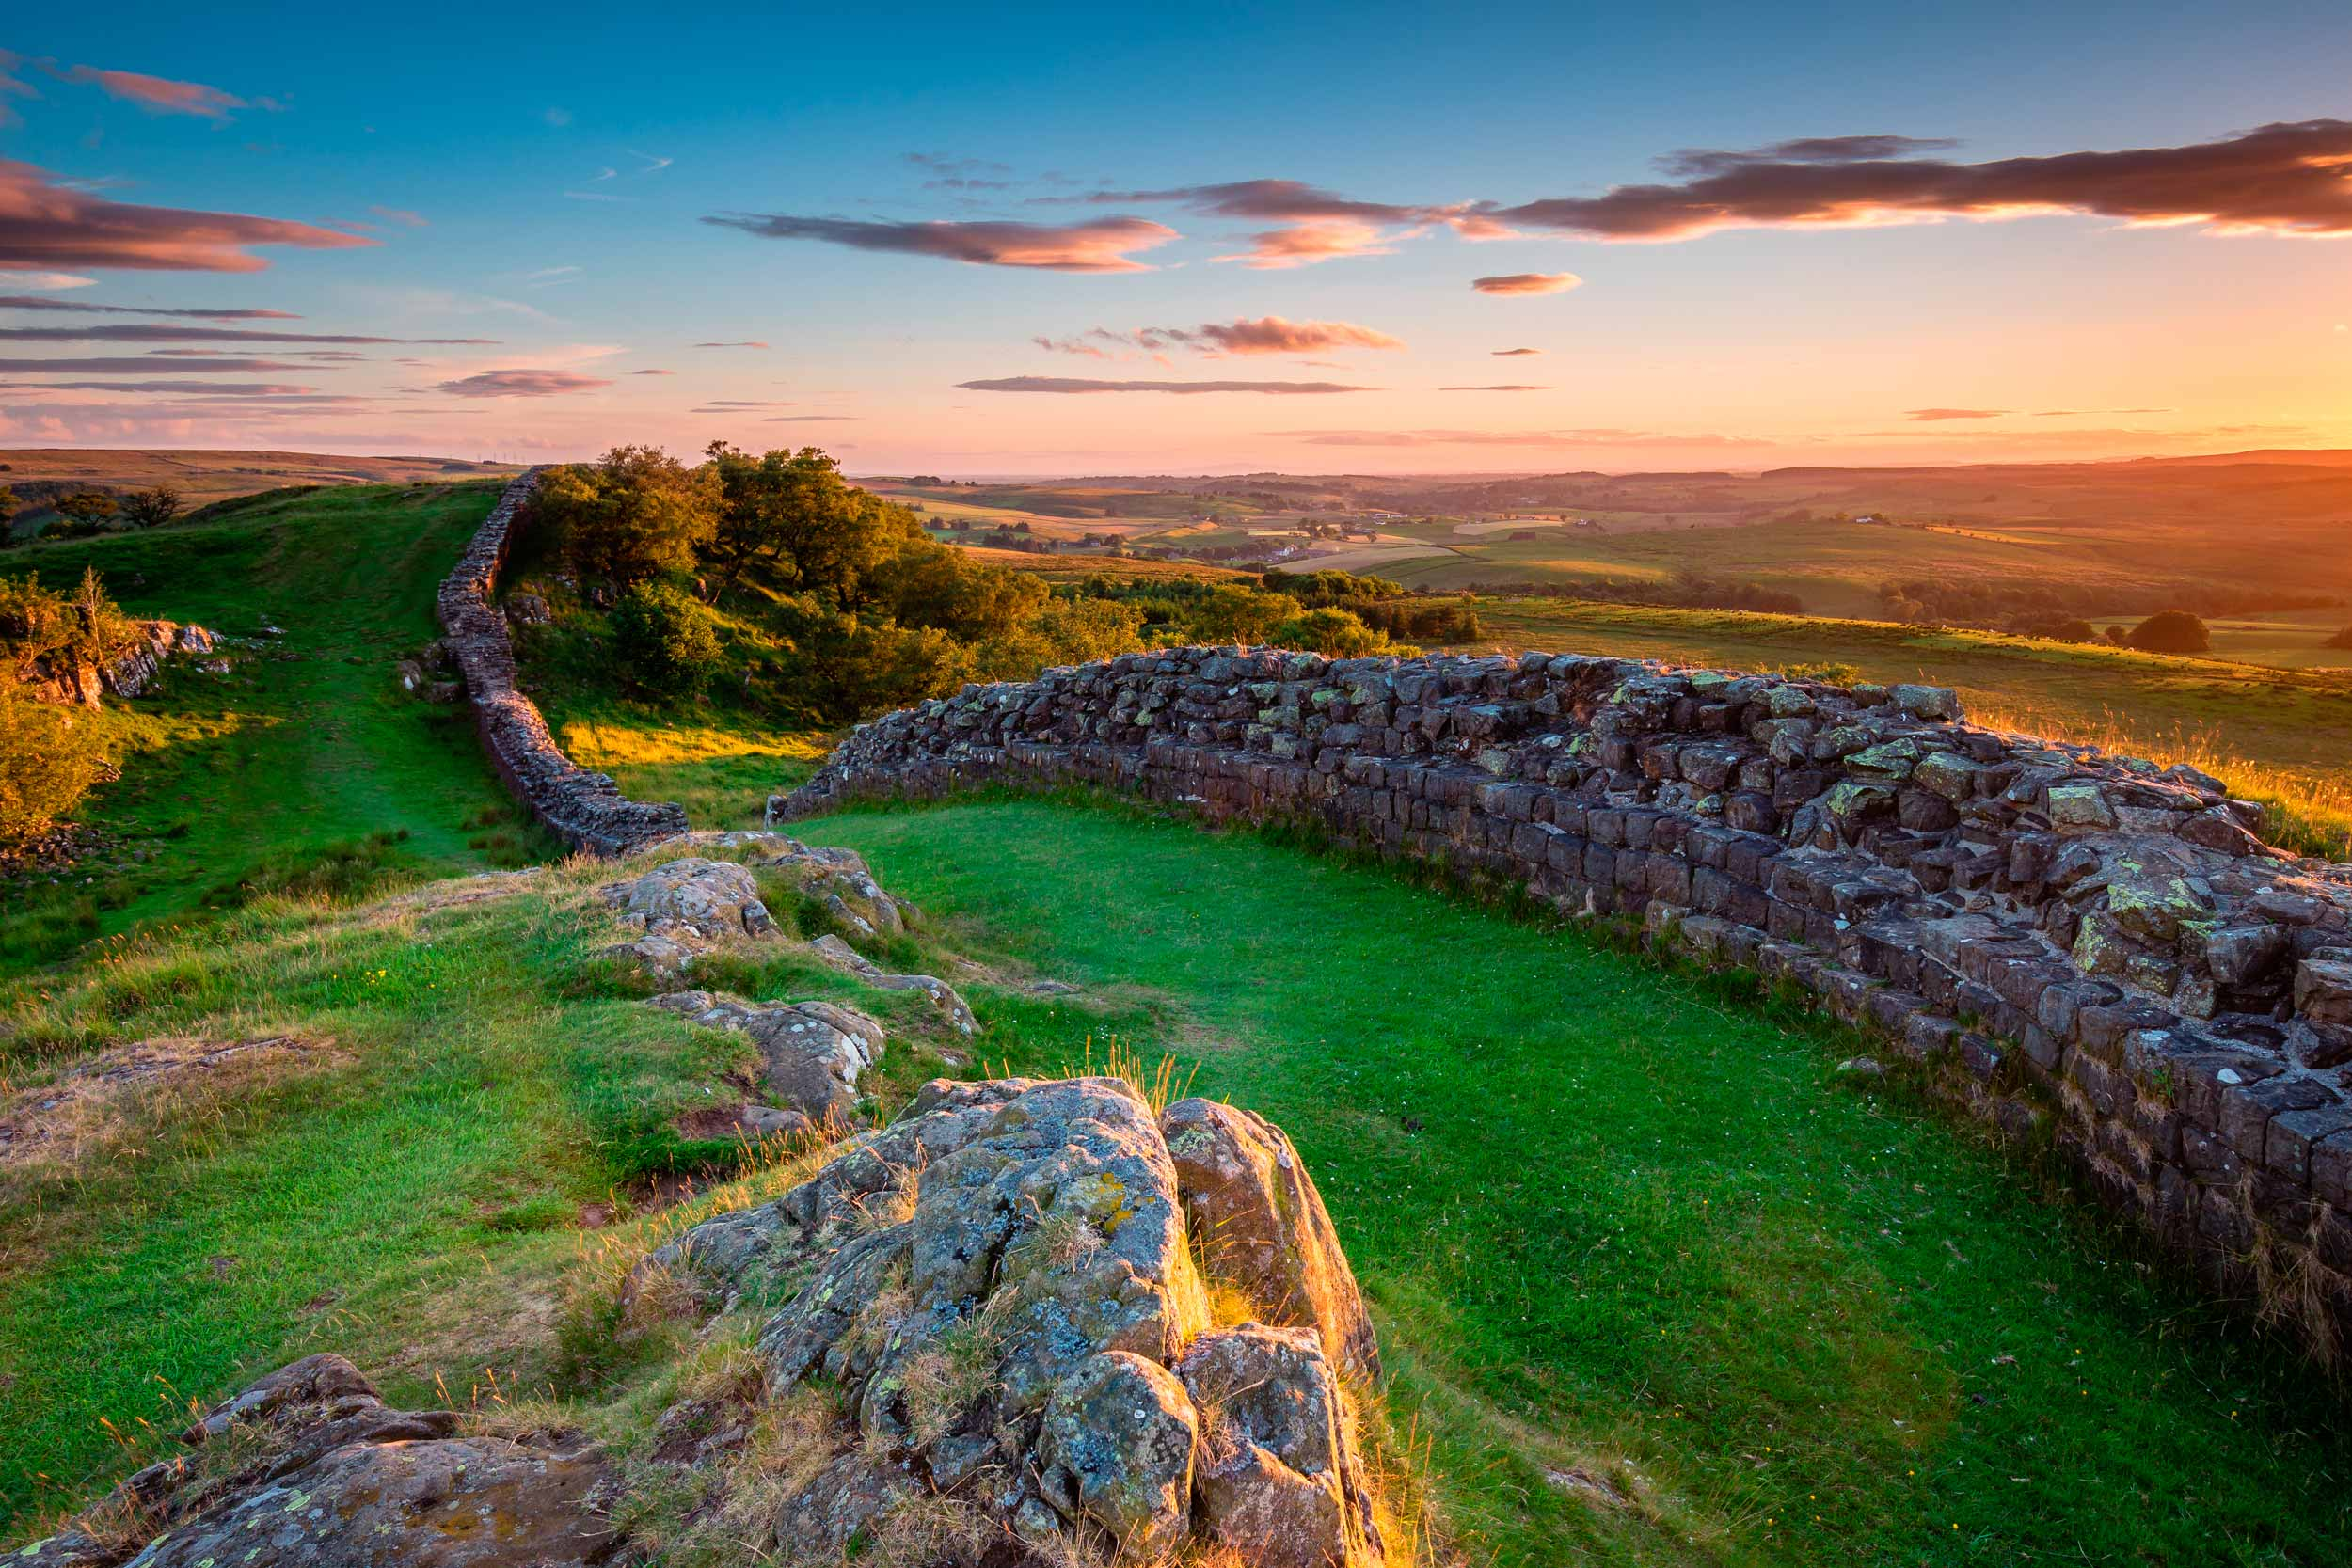 Hadrian's Wall, near Walltown, Northumberland, England  (Dave Head/Shutterstock)